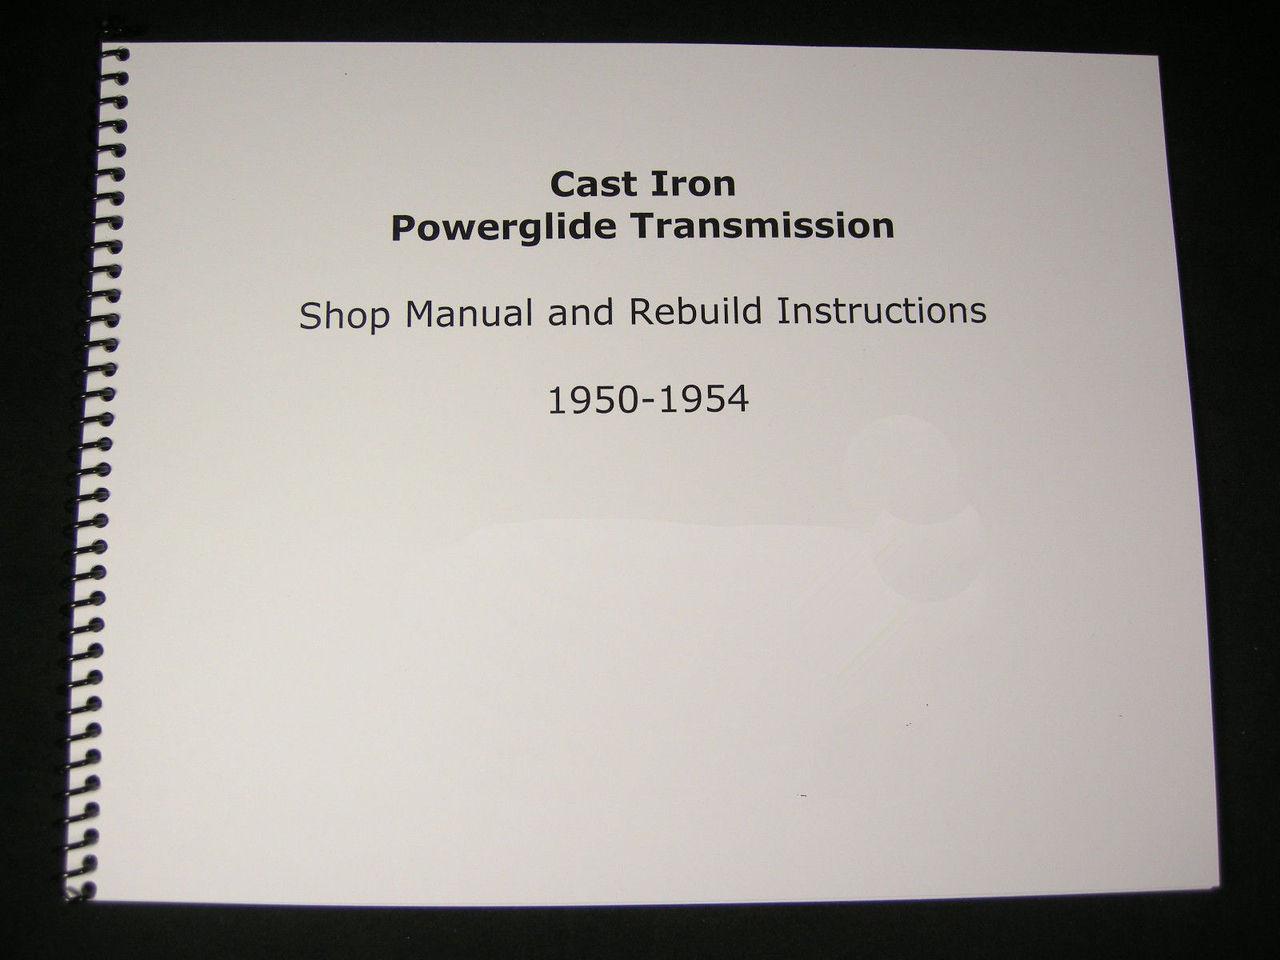 hight resolution of 1950 1954 cast iron powerglide shop manual overhaul rebuild 4l80e transmission diagram 1950 1954 cast